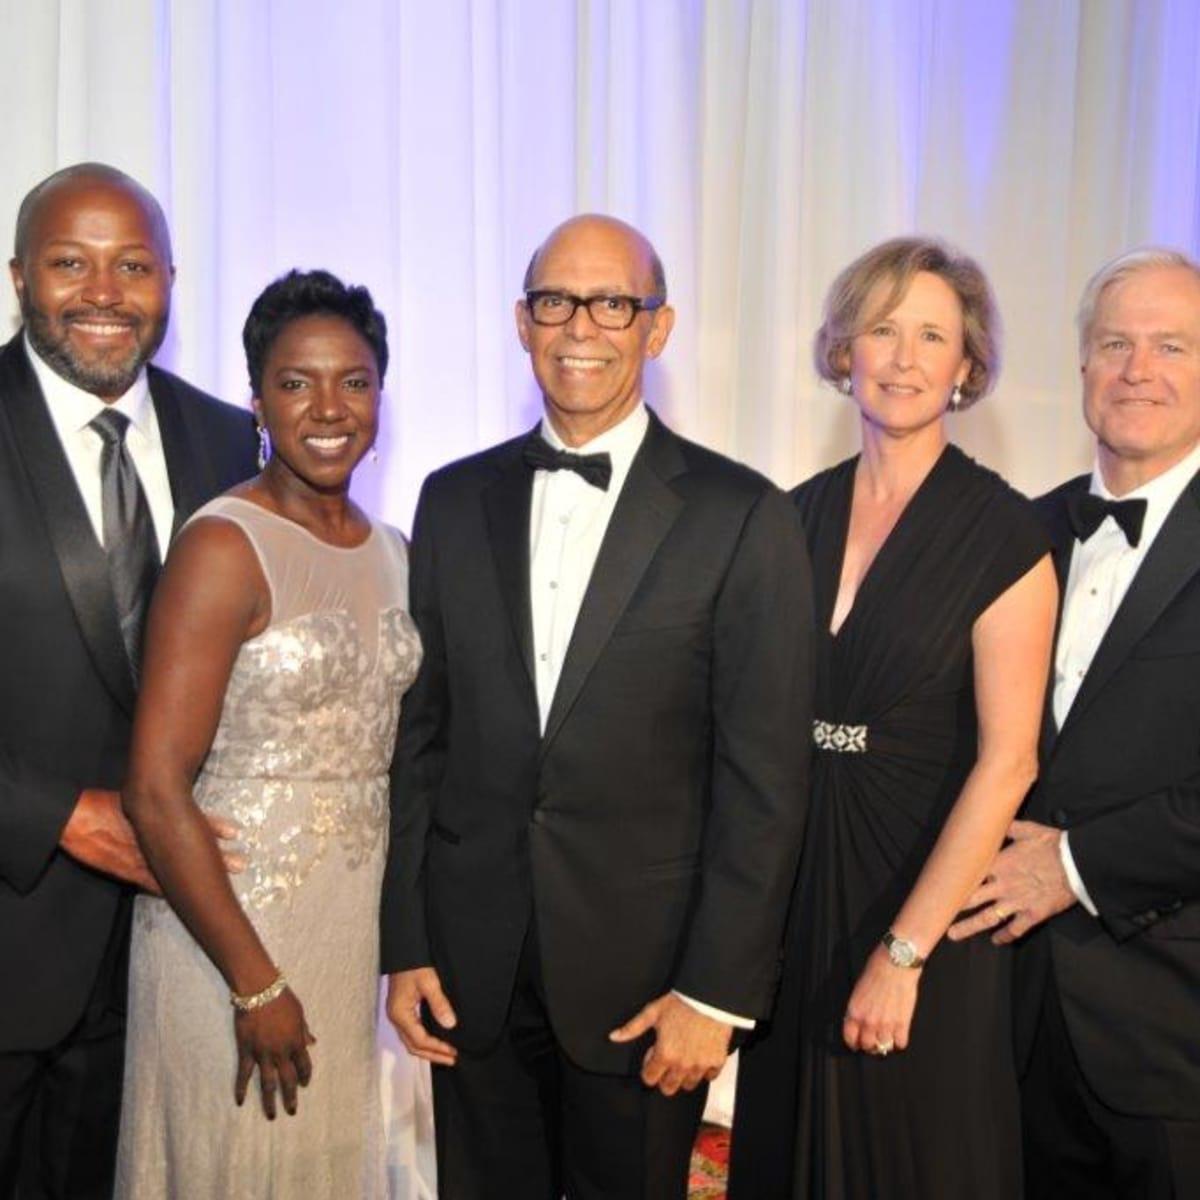 News, UNCF Gala, Nov. 2015, Jeffrey Webber, Kethia Webber, Michael Lomax, Sara Foshee, Doug Foshee